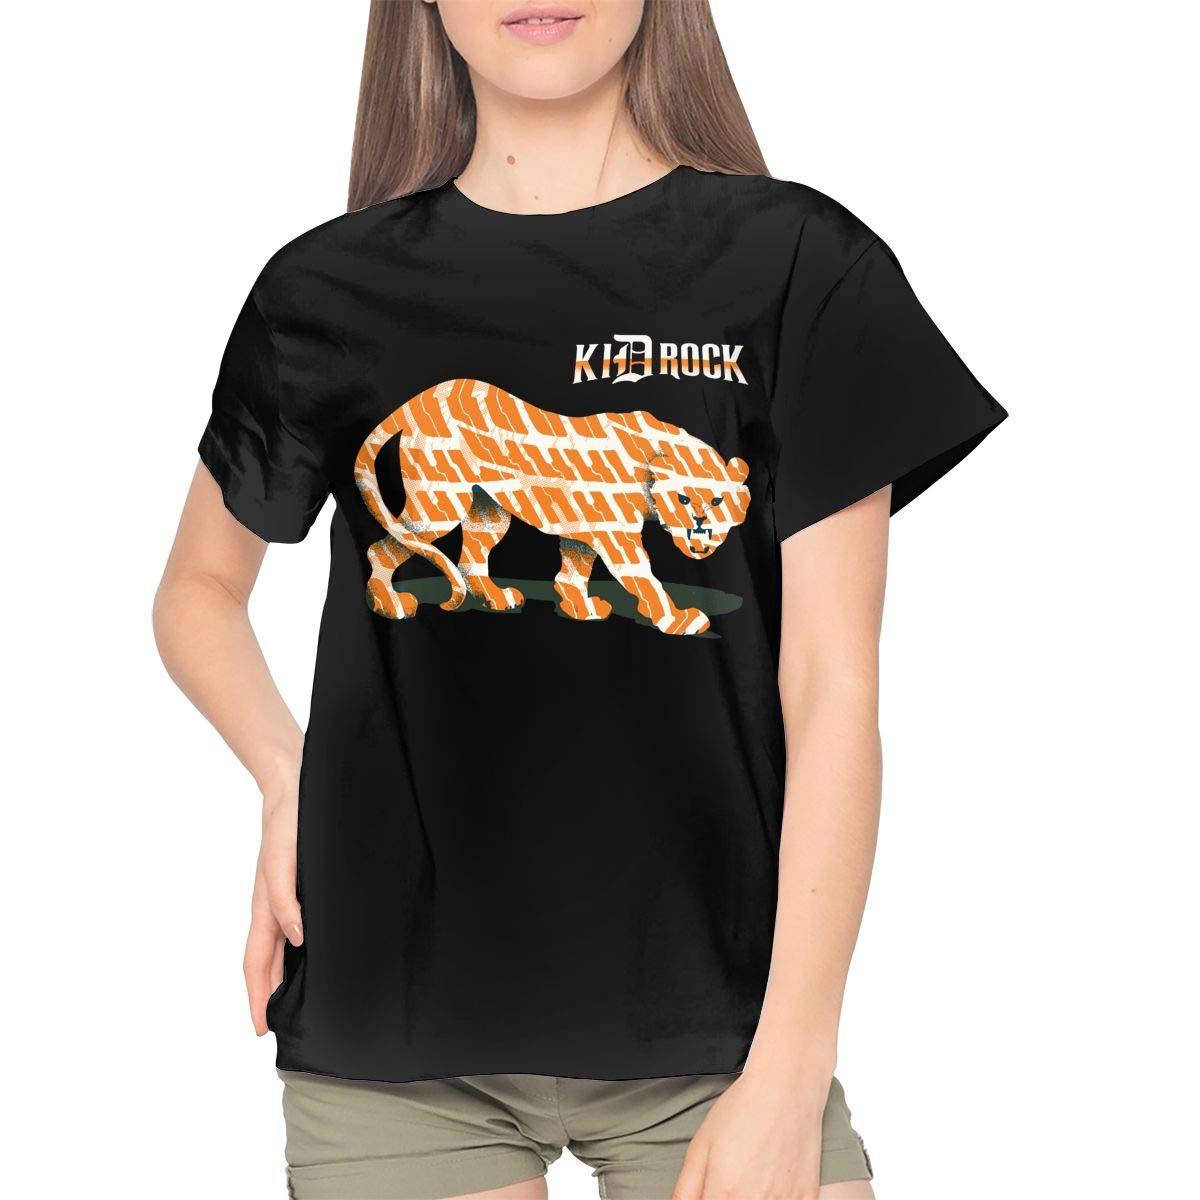 Rock Logos Cheetah Comfortable Short Sleeve Singer Music Band T Shirts 4547